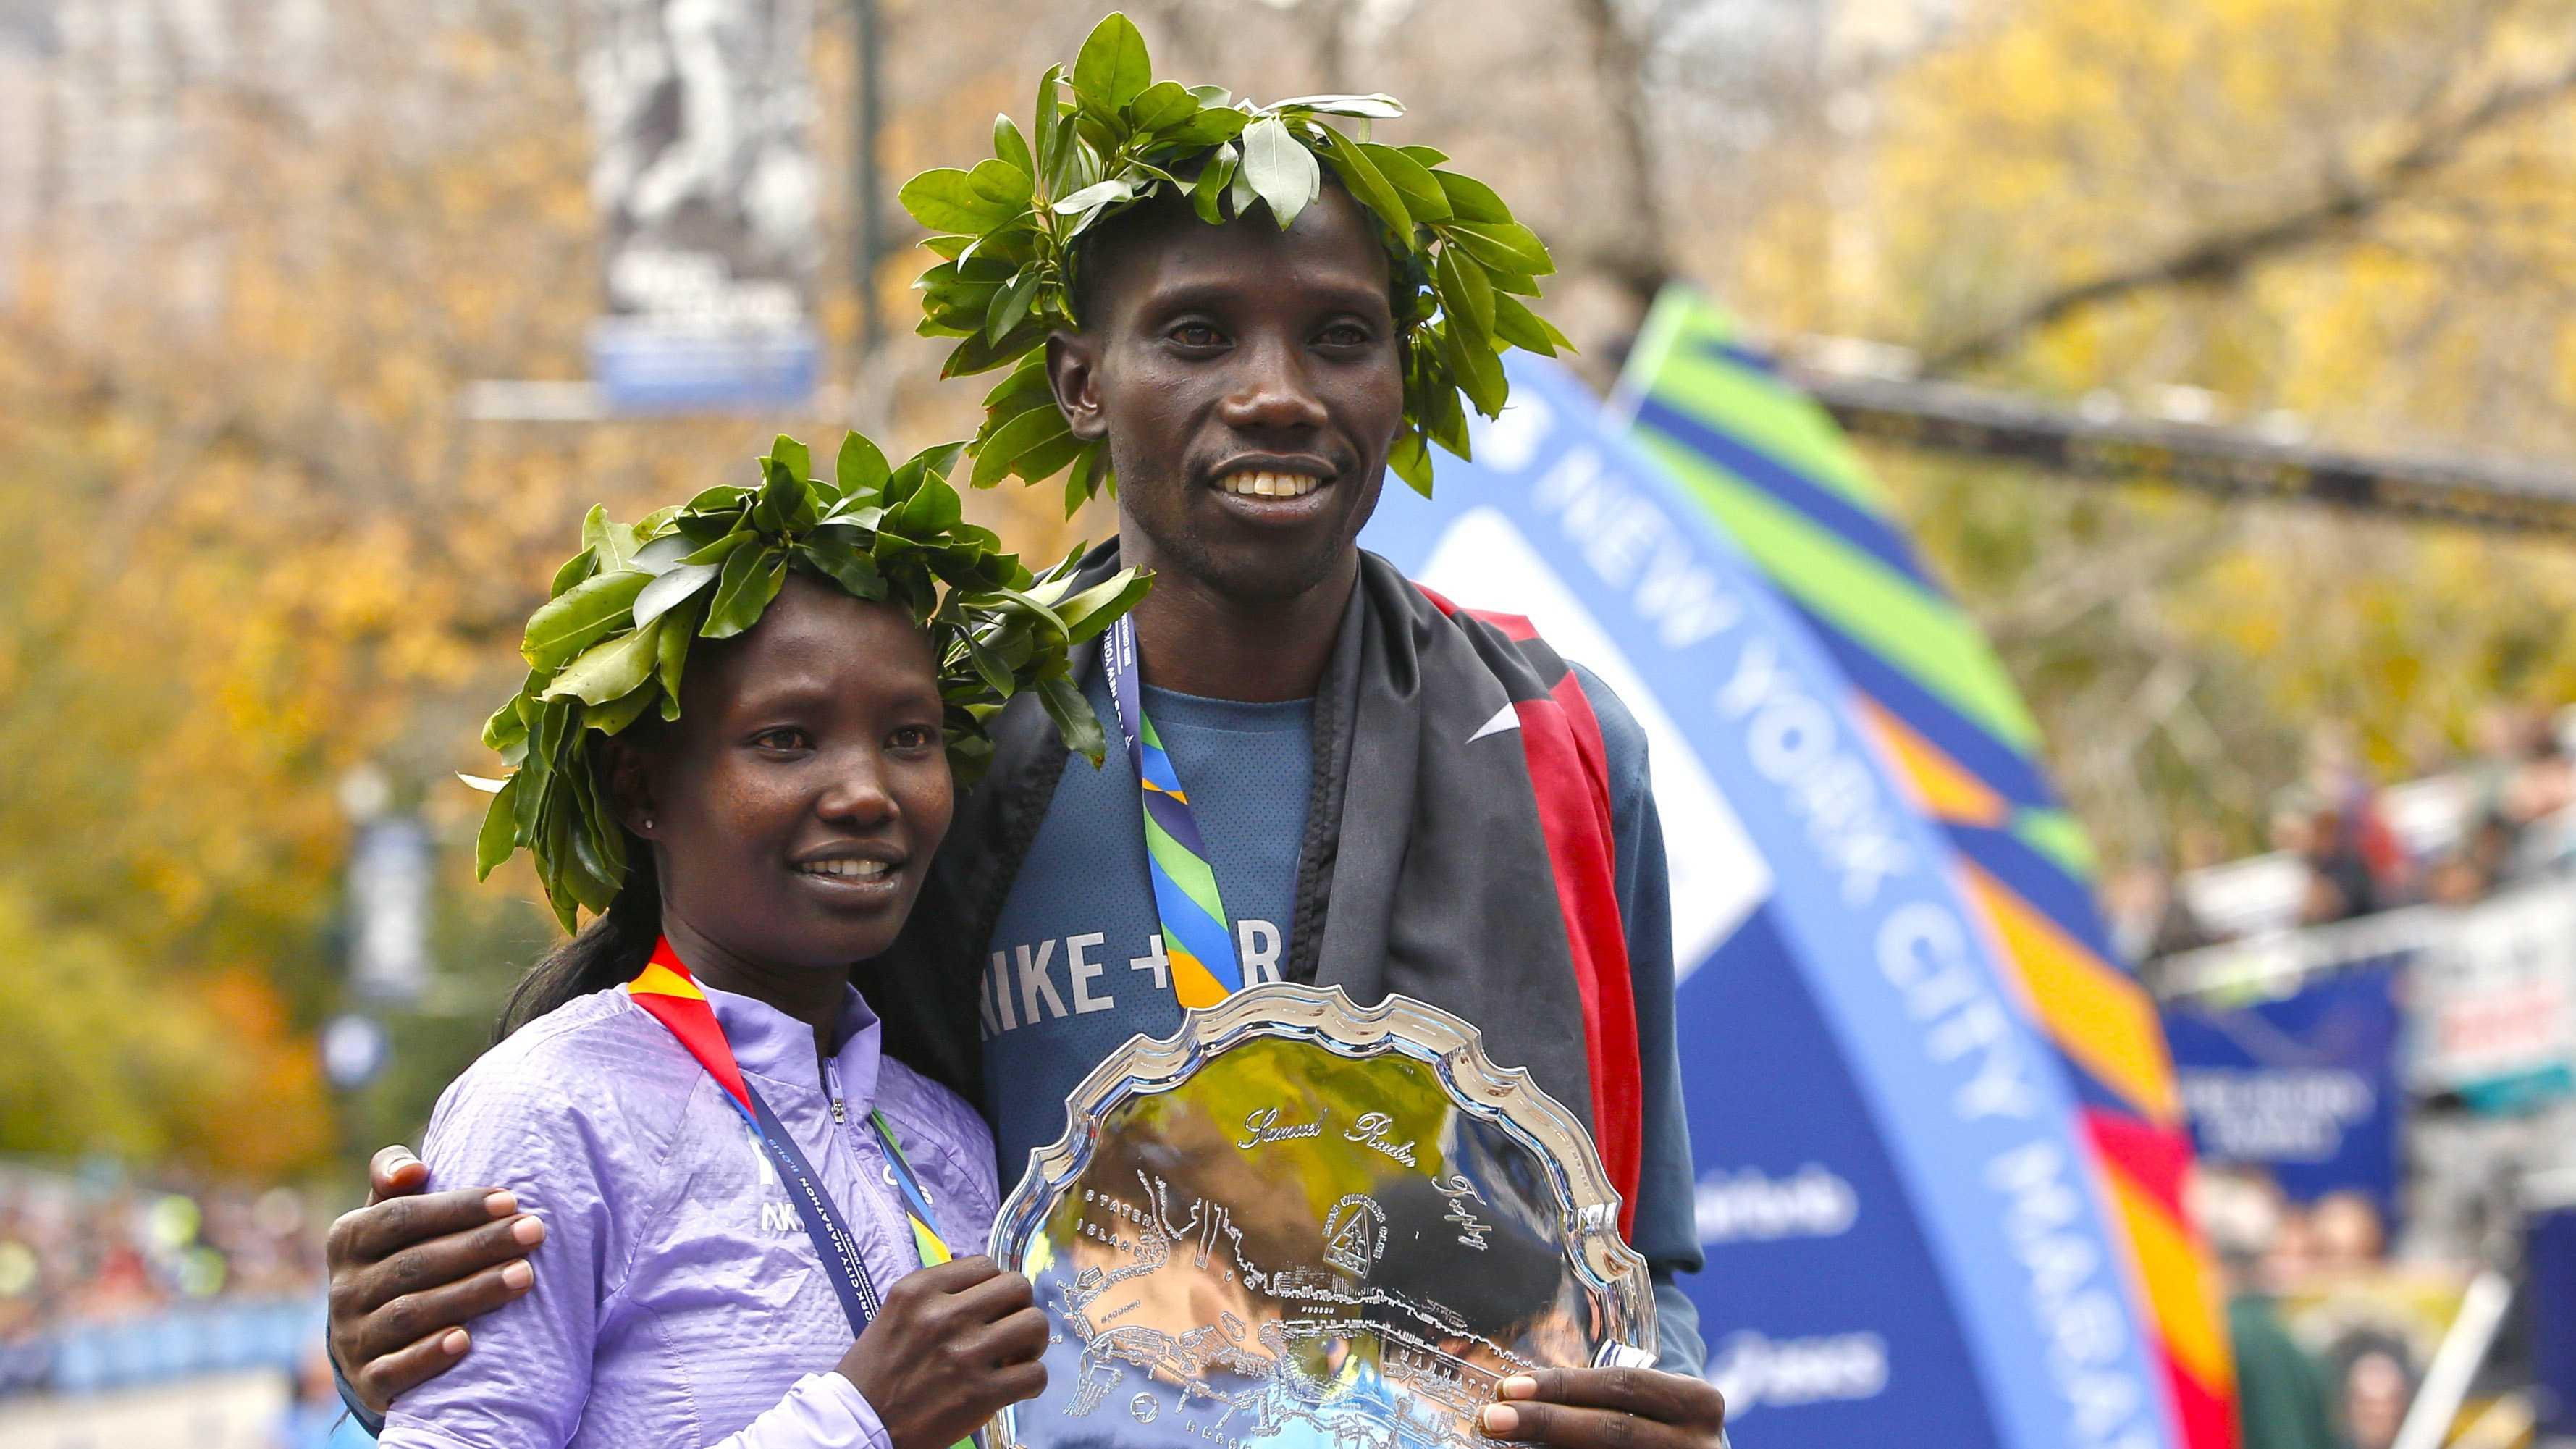 New York City marathon winners Mary Keitany and Stanley Biwott, both of Kenya, pose for photographers on the finish line of the the New York City marathon, Sunday, Nov. 1, 2015 in New York.